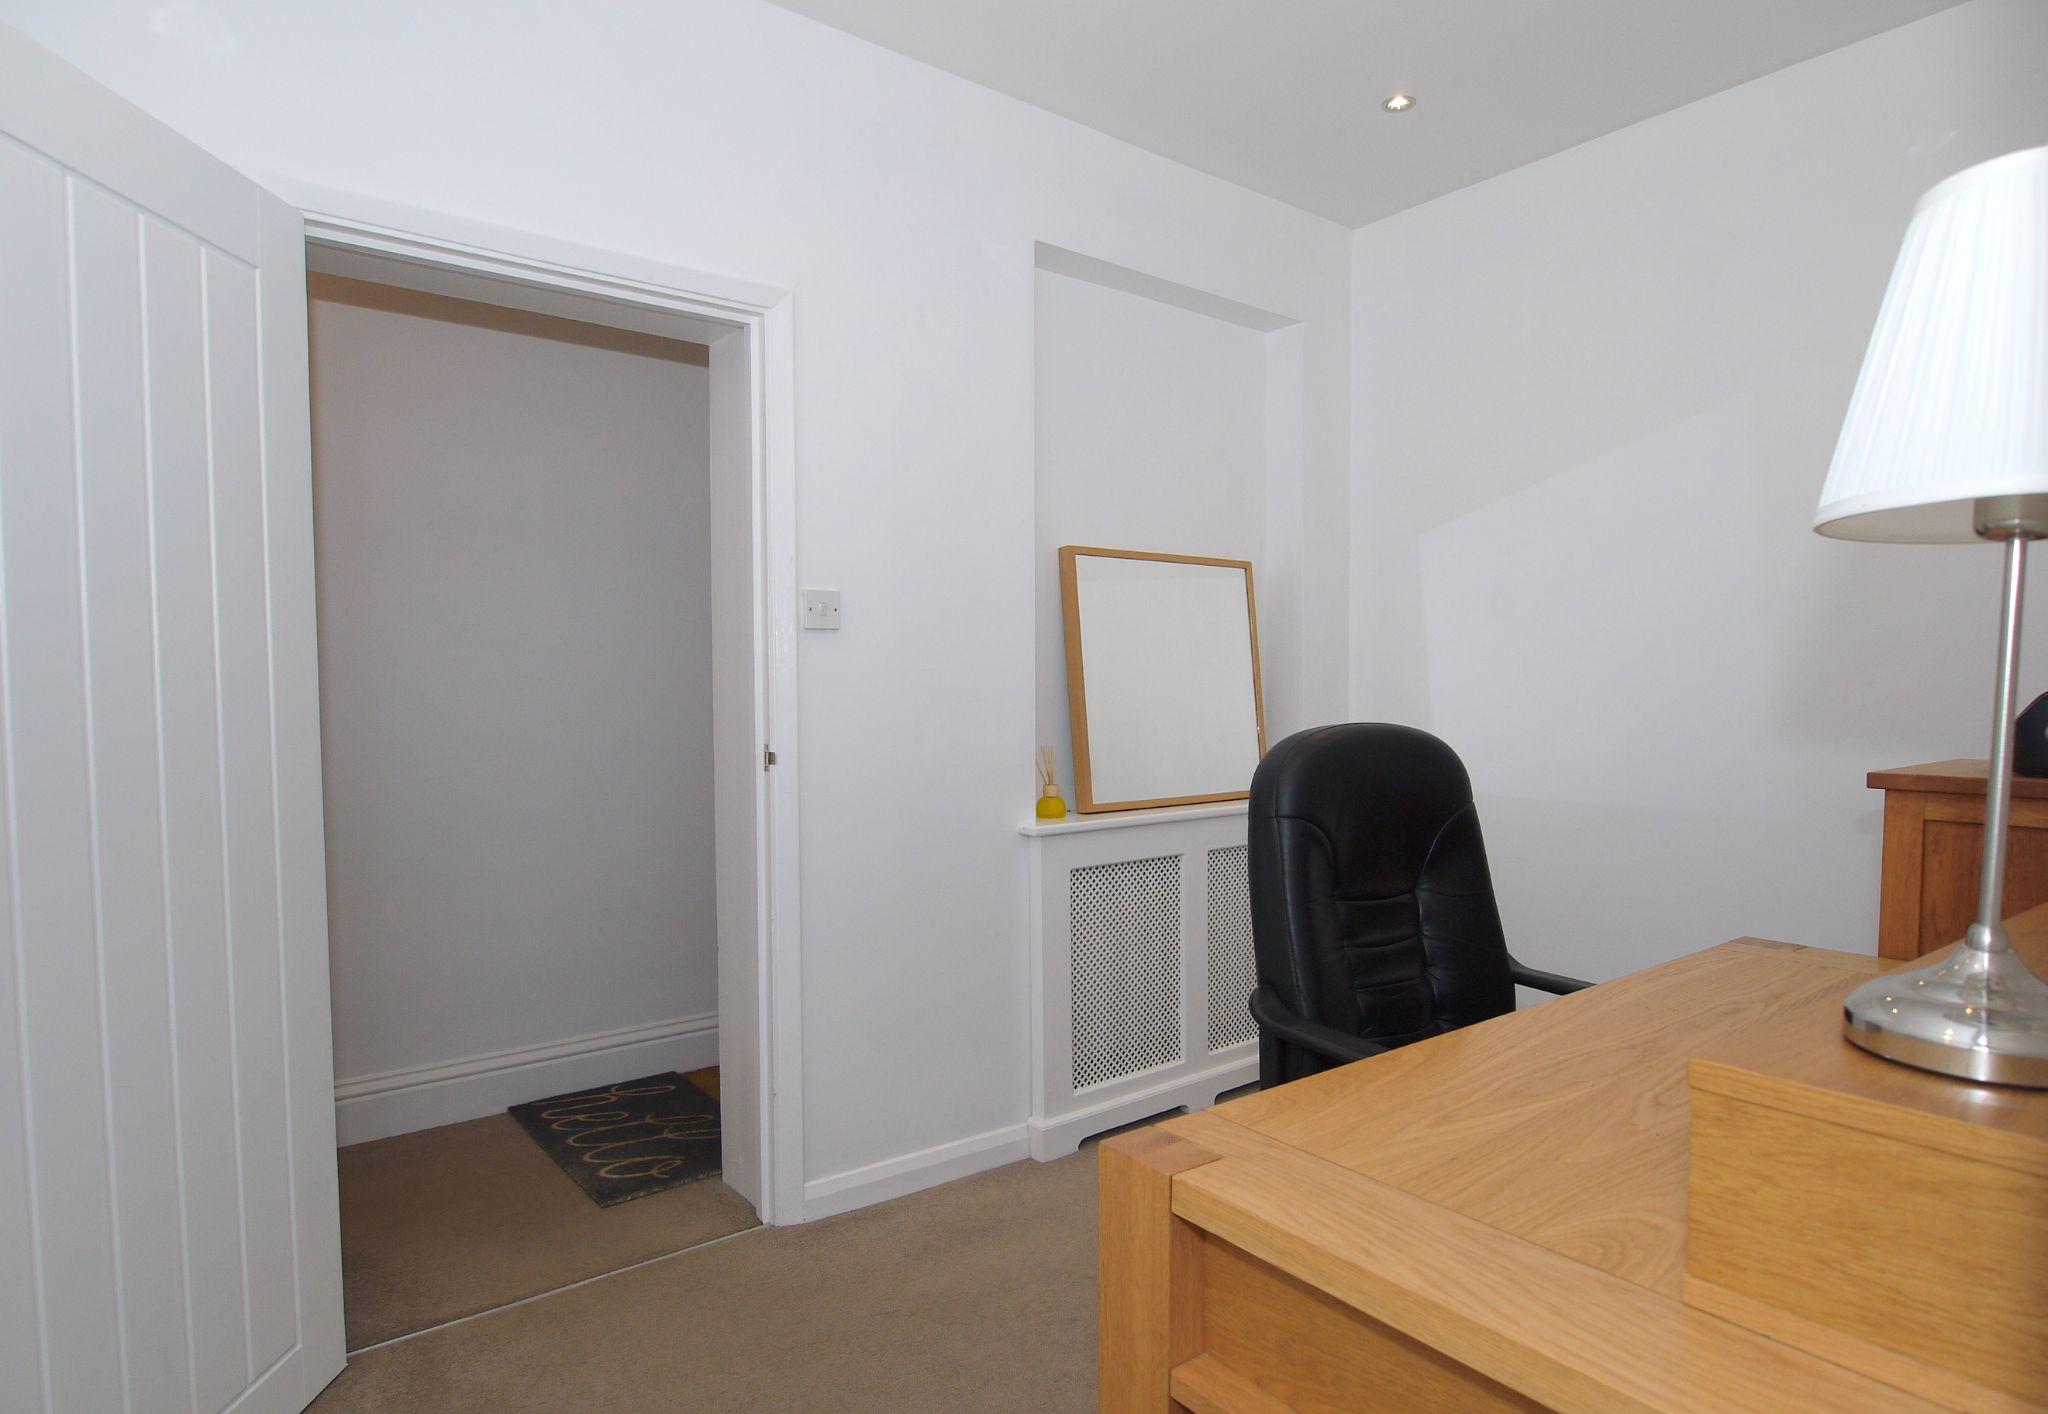 2 bedroom apartment flat/apartment Sold in Sevenoaks - Photograph 7